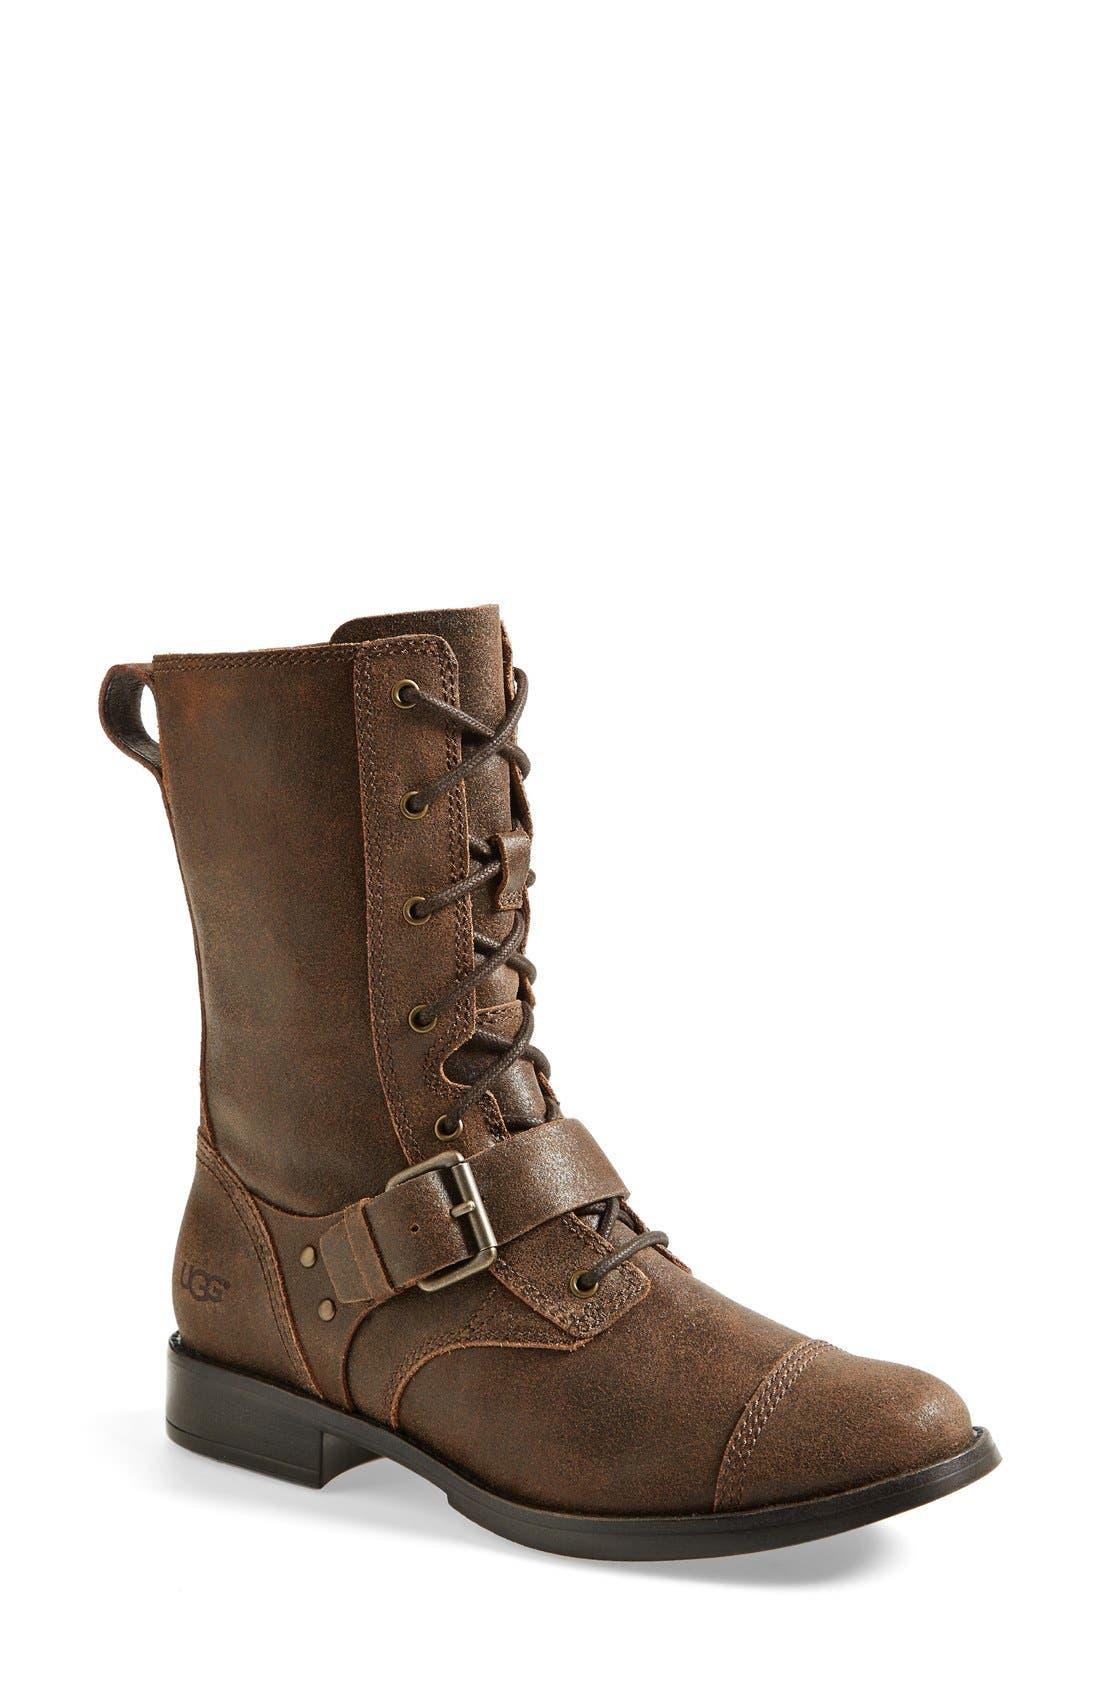 Alternate Image 1 Selected - UGG® Australia 'Marela' Convertible Combat Boot (Women)